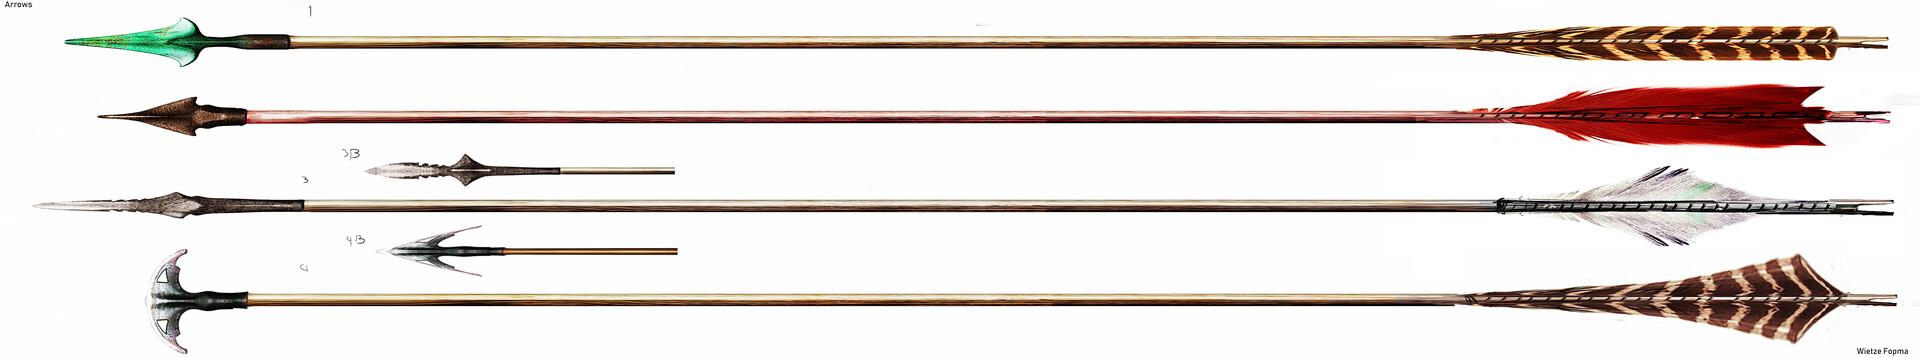 Wietze fopma arrows